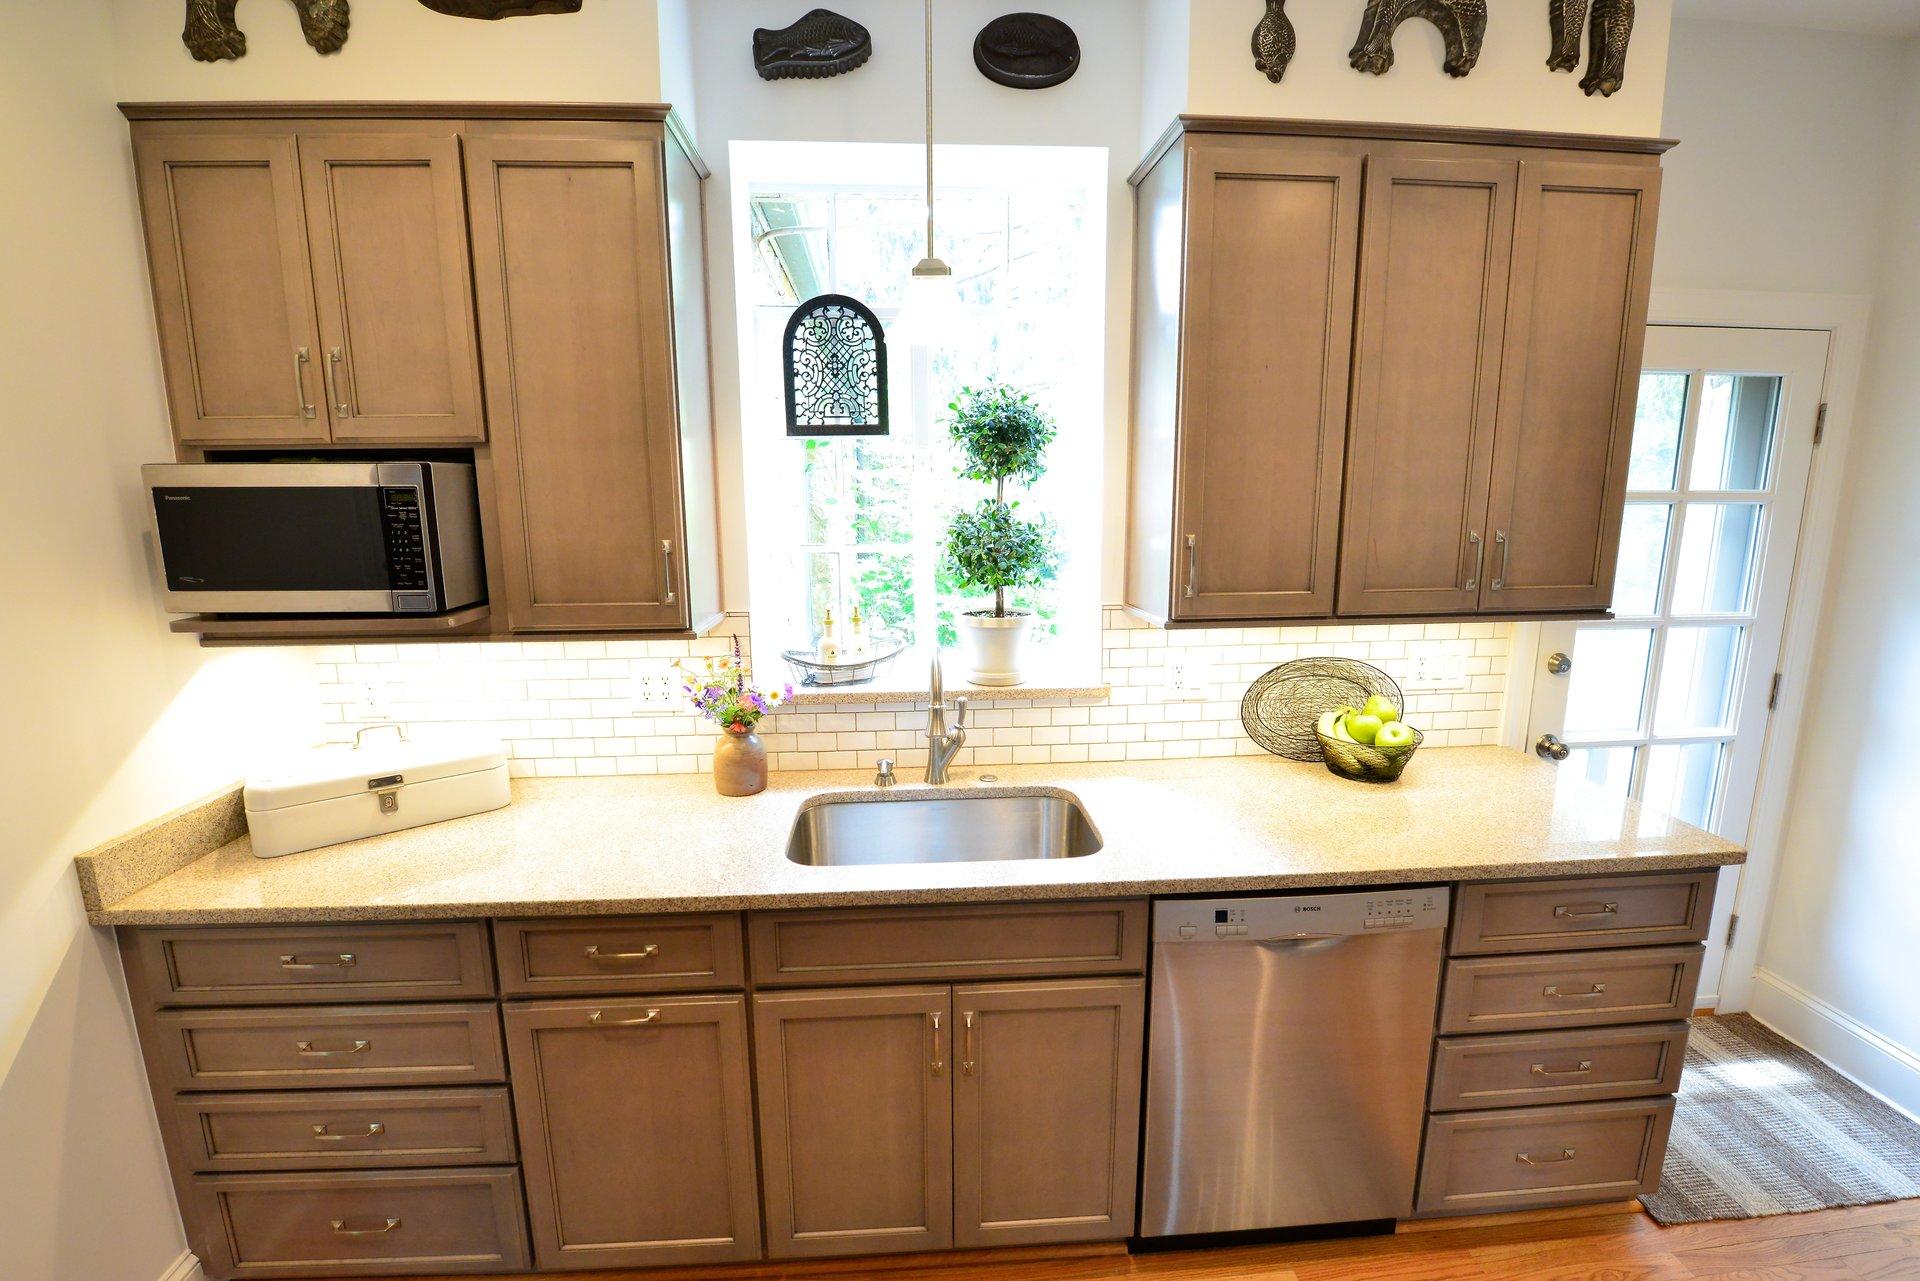 Terranova Construction Kitchen & Bath image 1